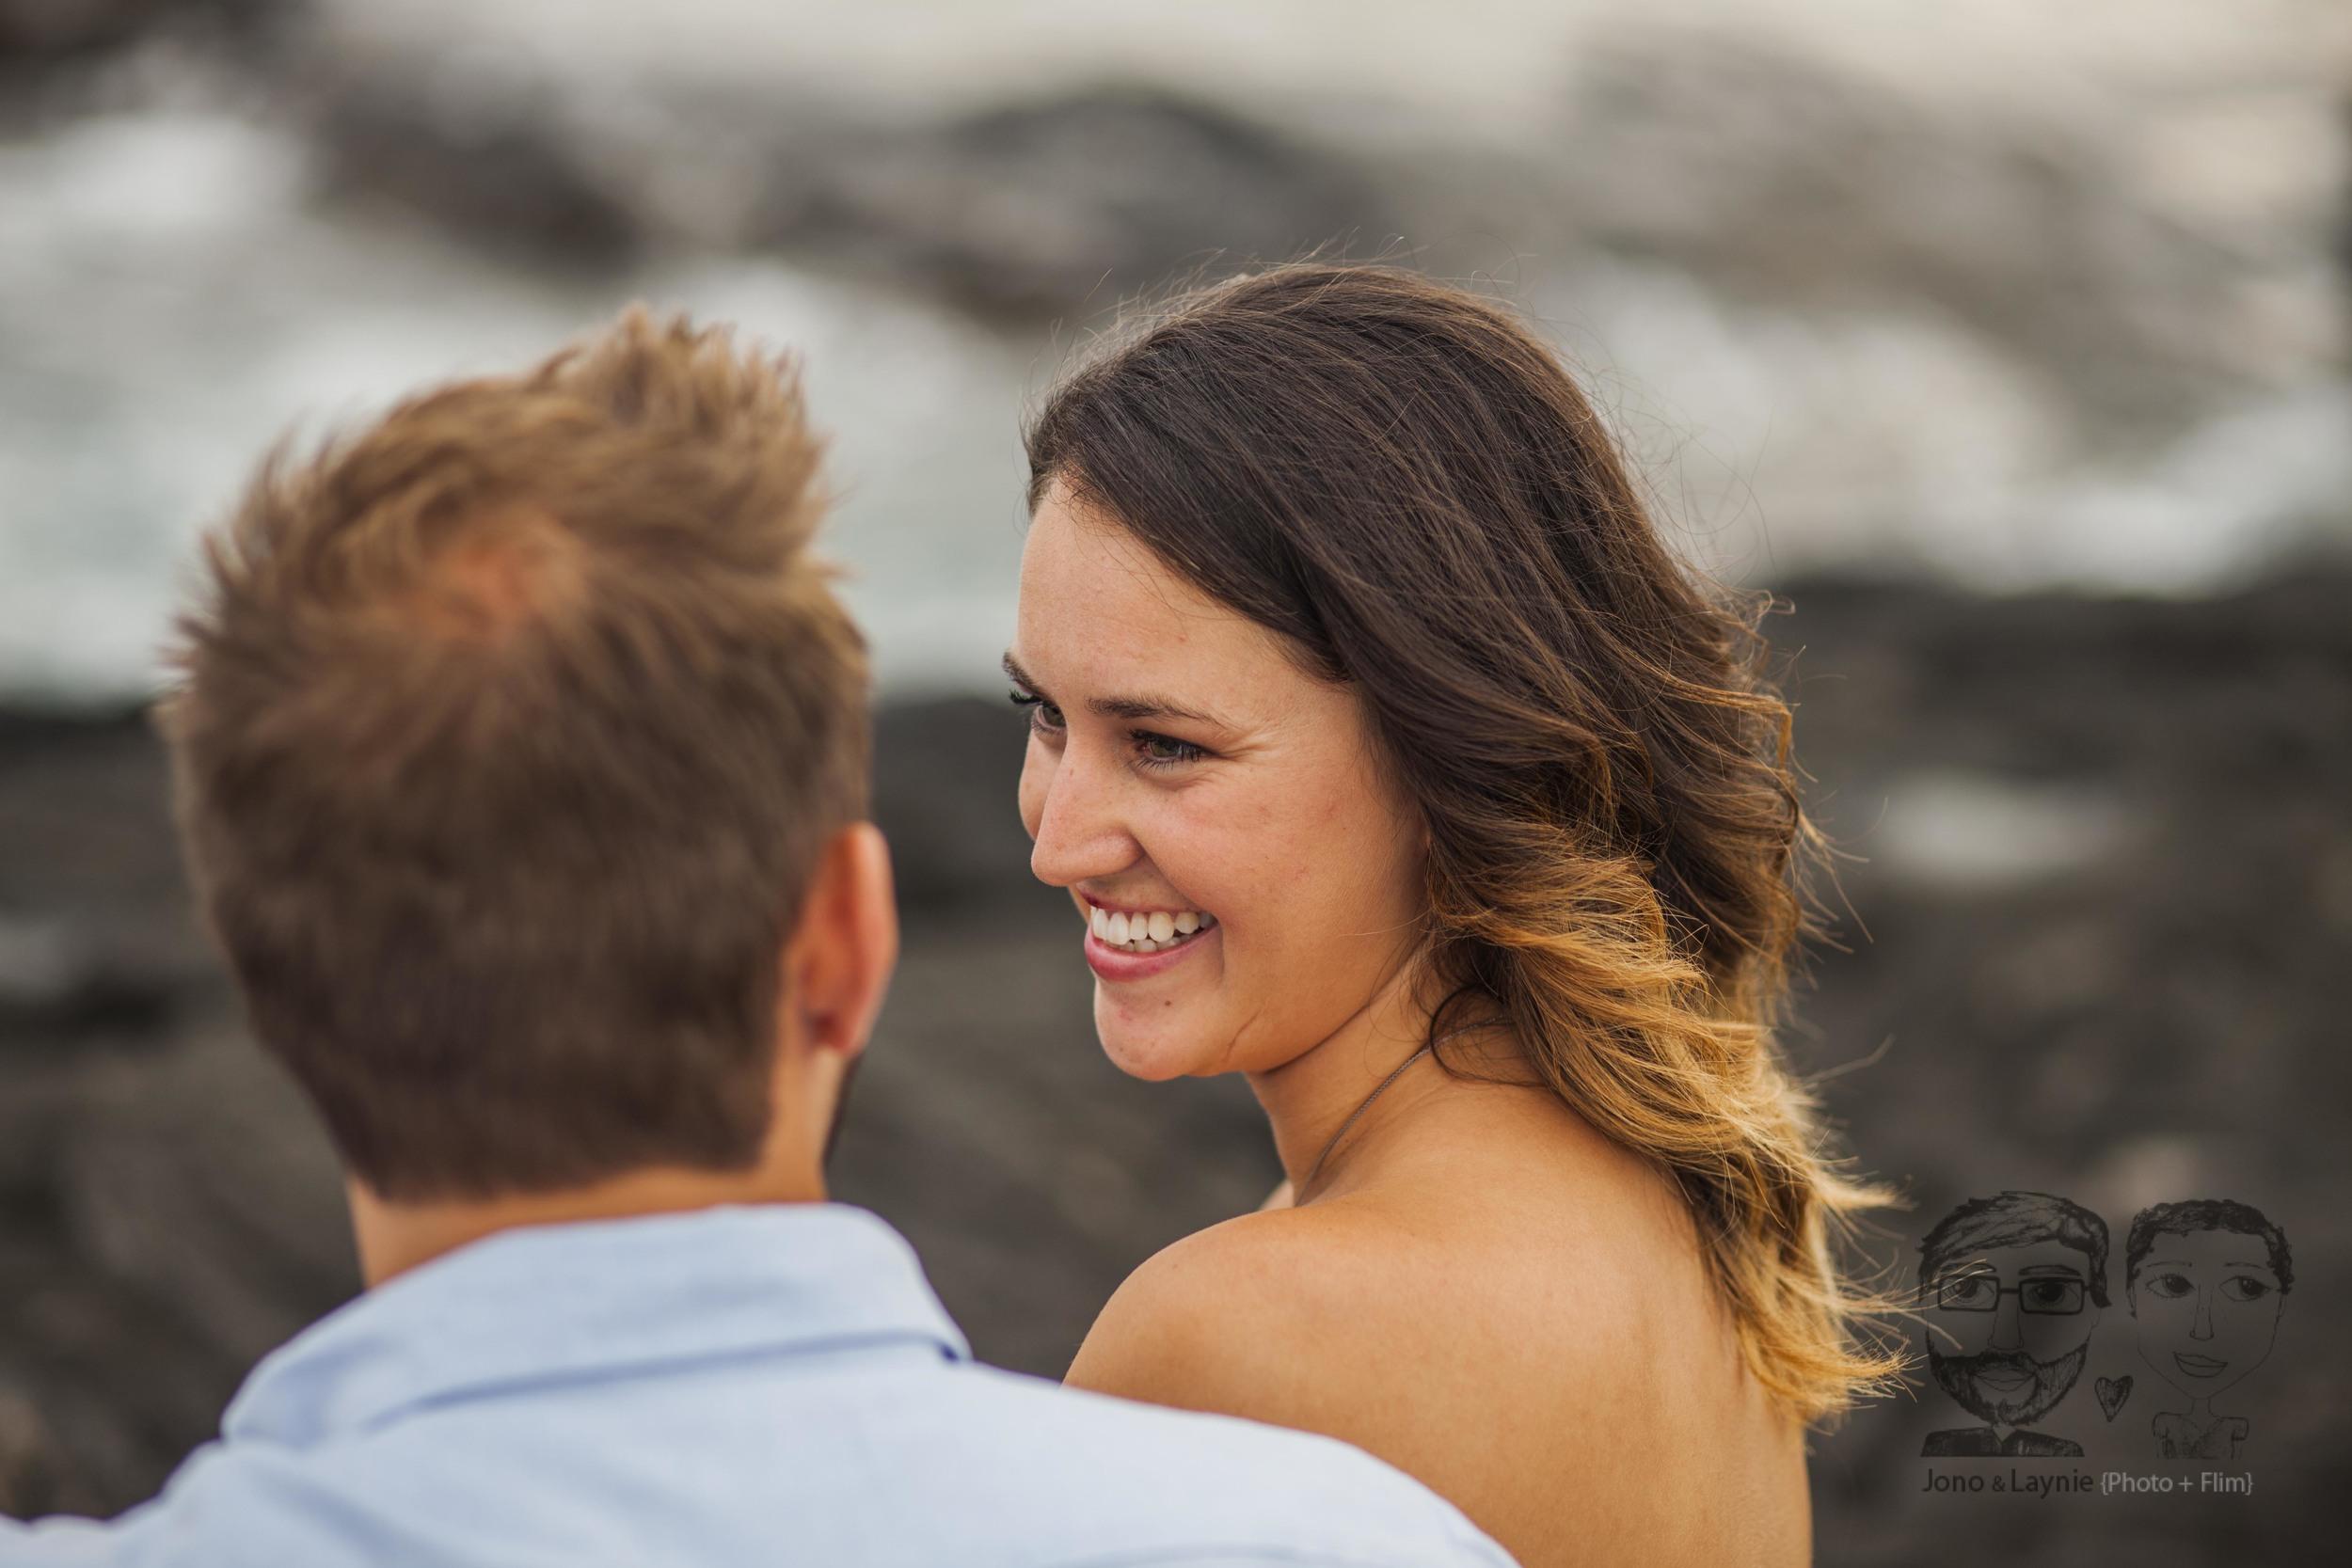 Jono & Laynie Co.-Kona, Hawaii-Engagement Session10.jpg